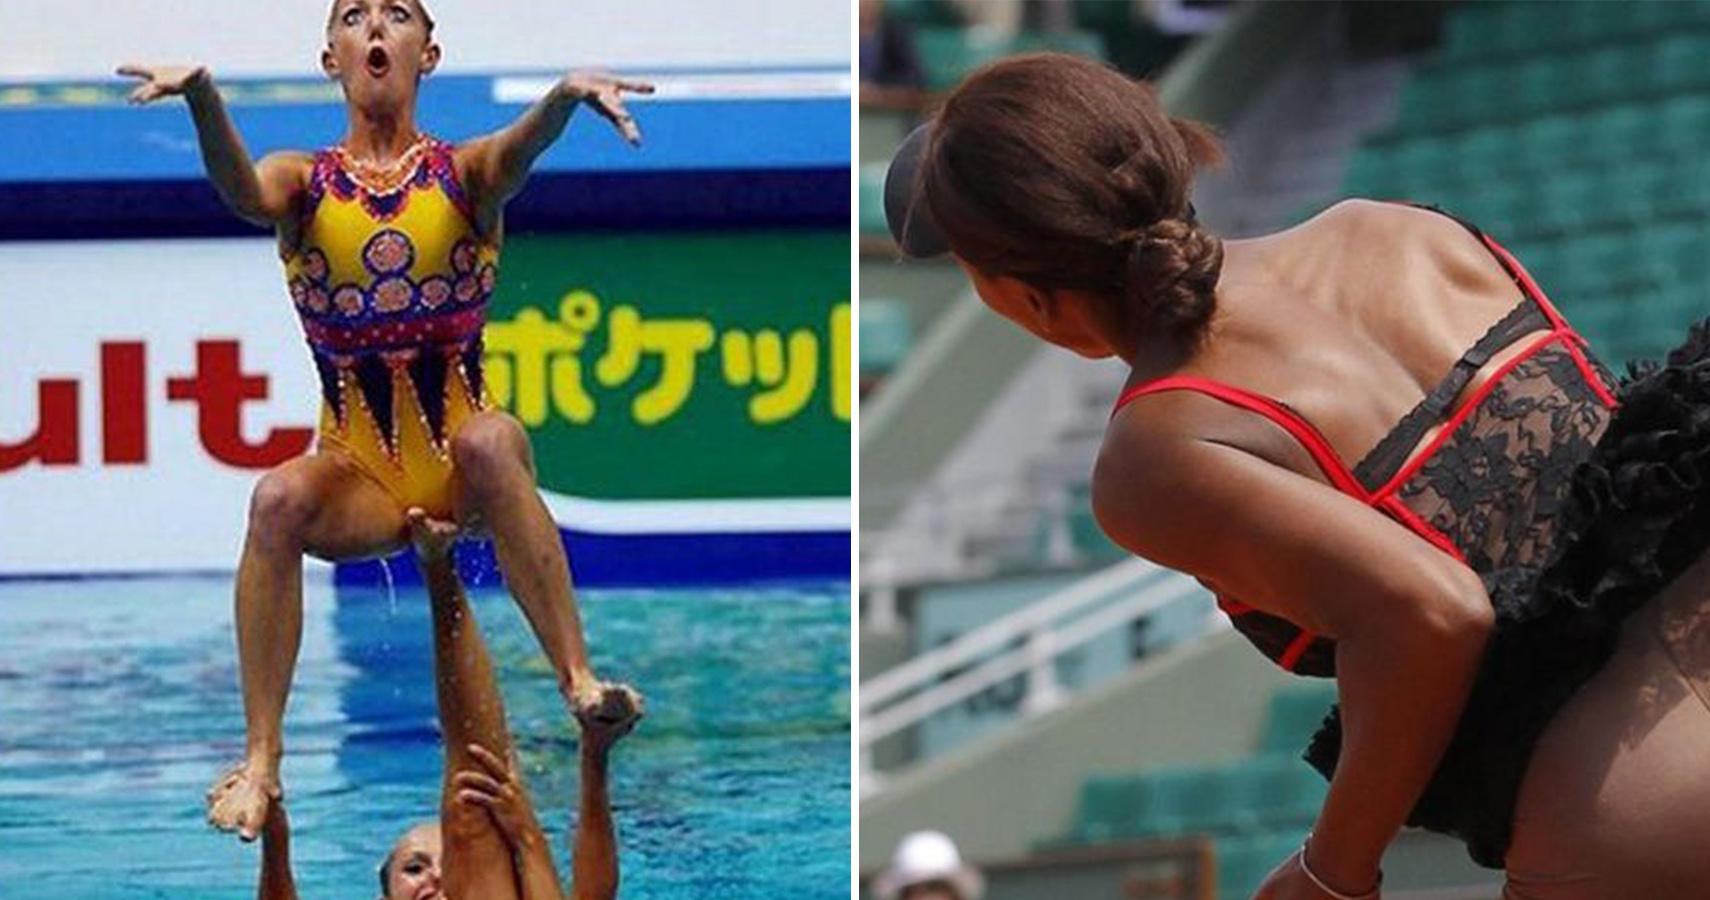 Female Gymnast Wardrobe Malfunctions The Perfect